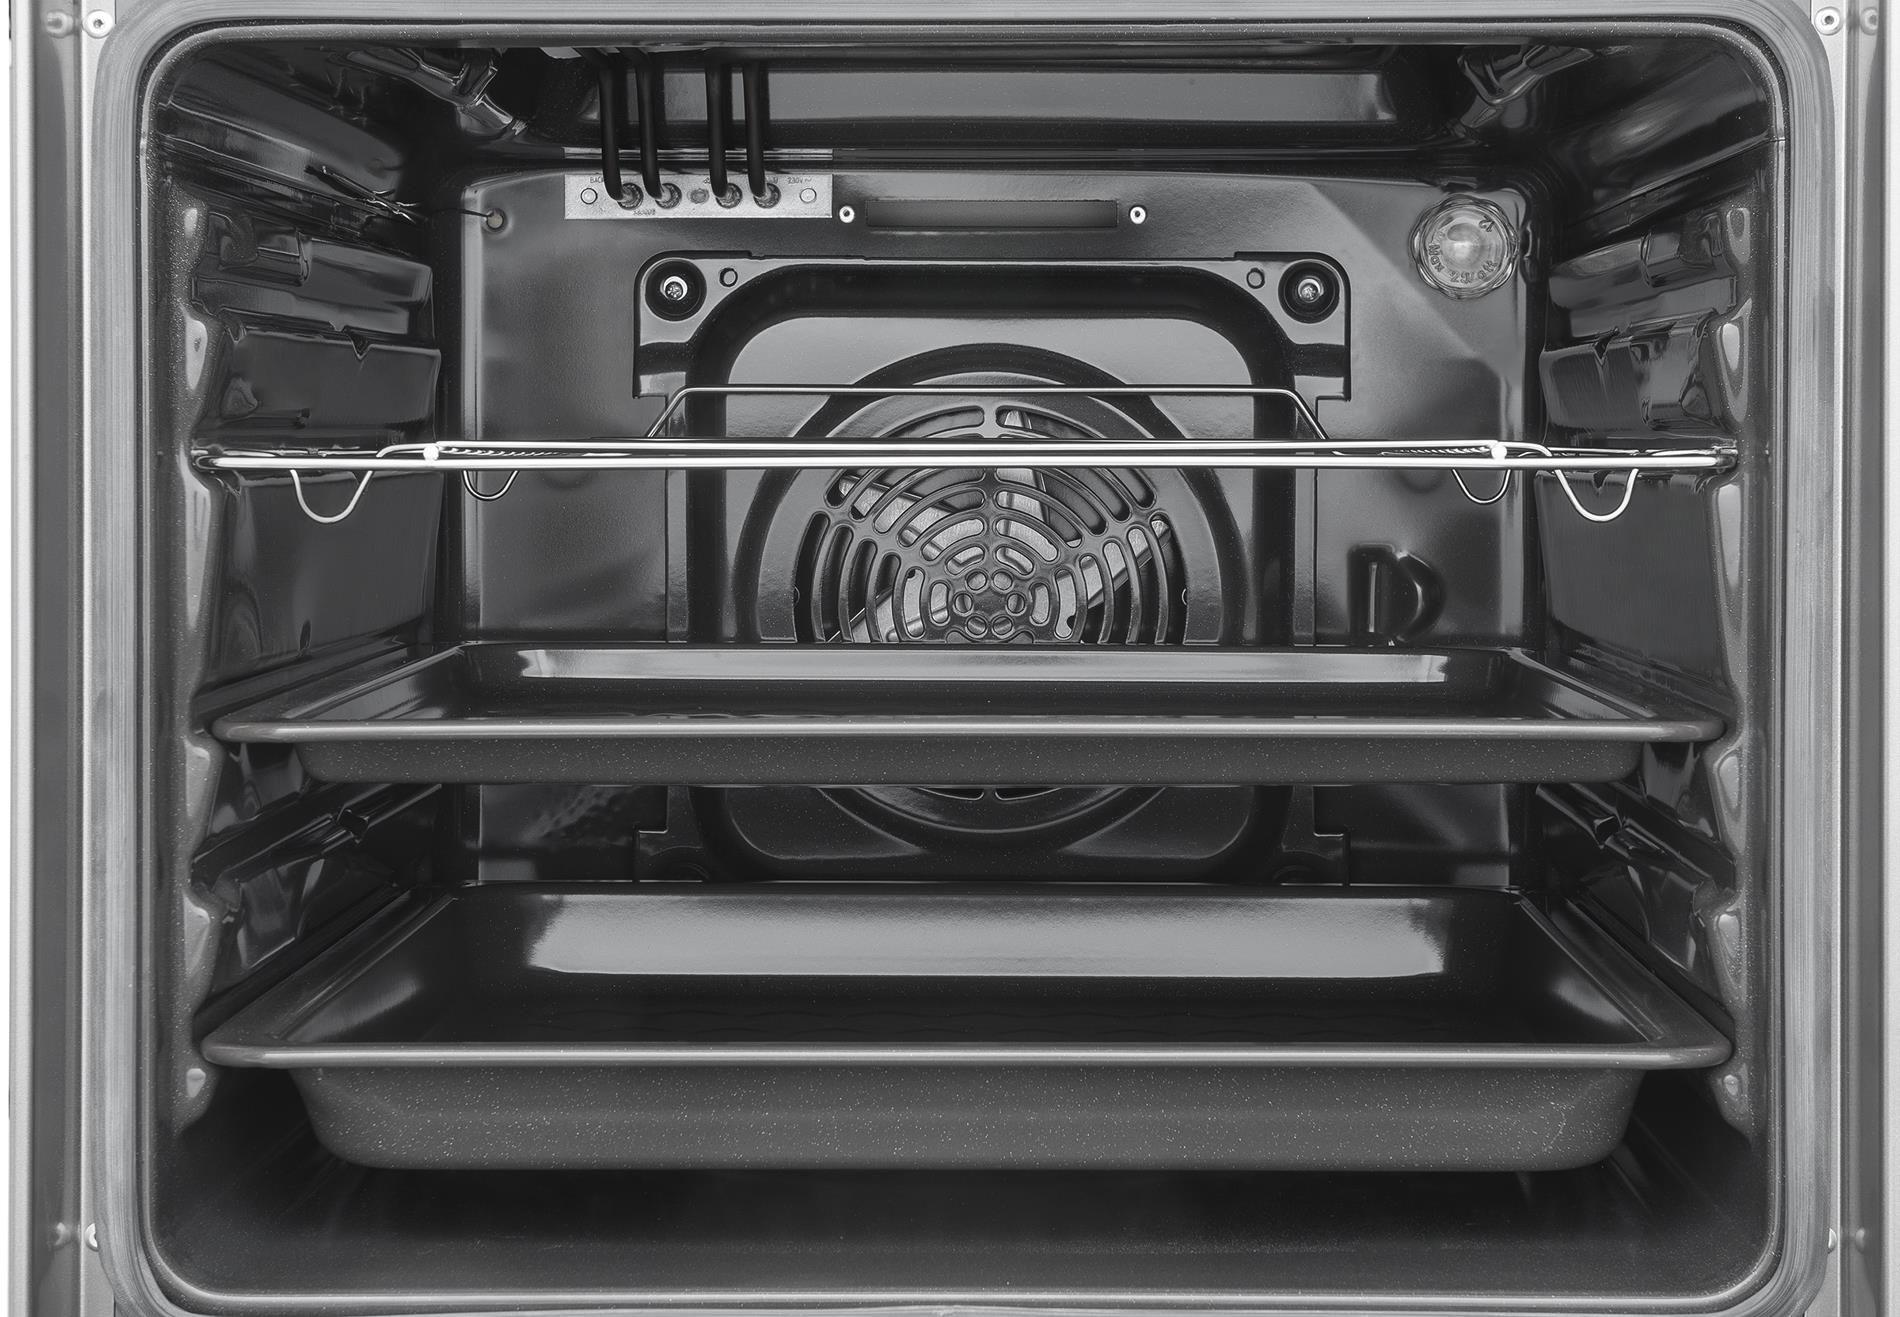 Free standing gas electric cooker 58GED2 33HZpTaQ(Xx)  Amica -> Kuchnie Gazowe Amica Akcesoria